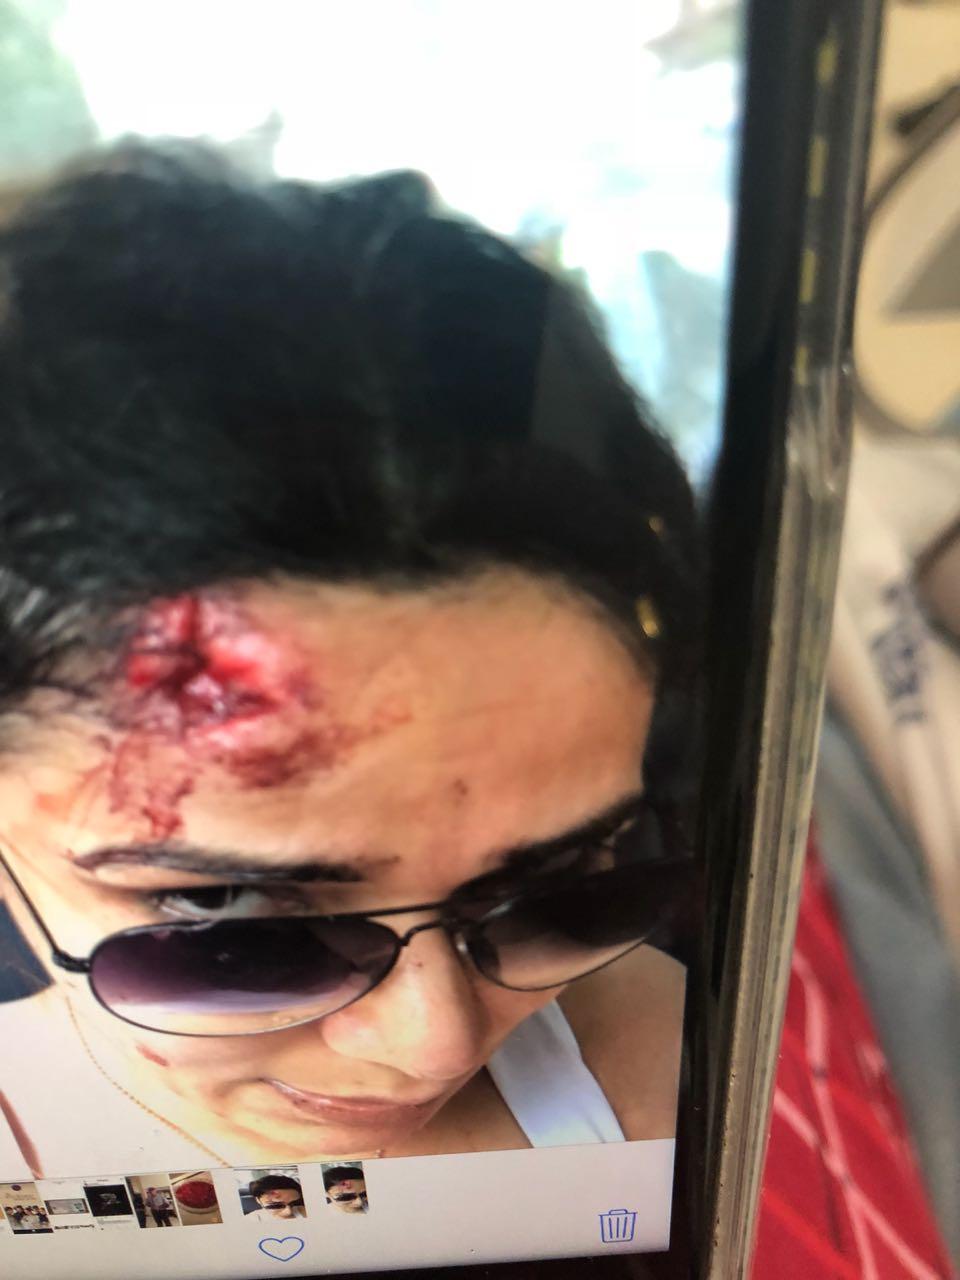 Armaan Kohli Beats Up Girlfriend Neeru Randhawa And is Now Missing!